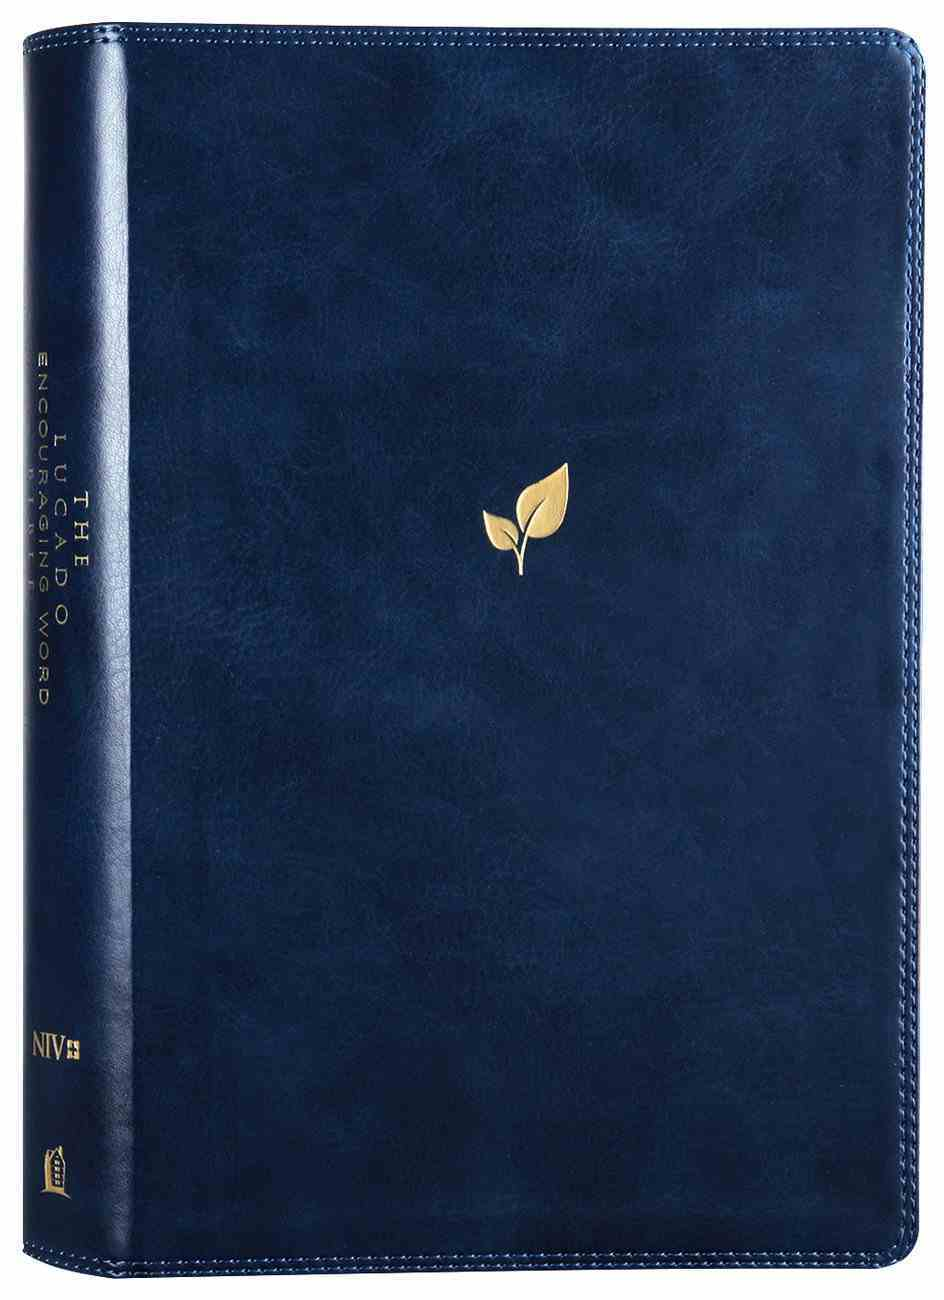 NIV Lucado Encouraging Word Bible Blue Premium Imitation Leather